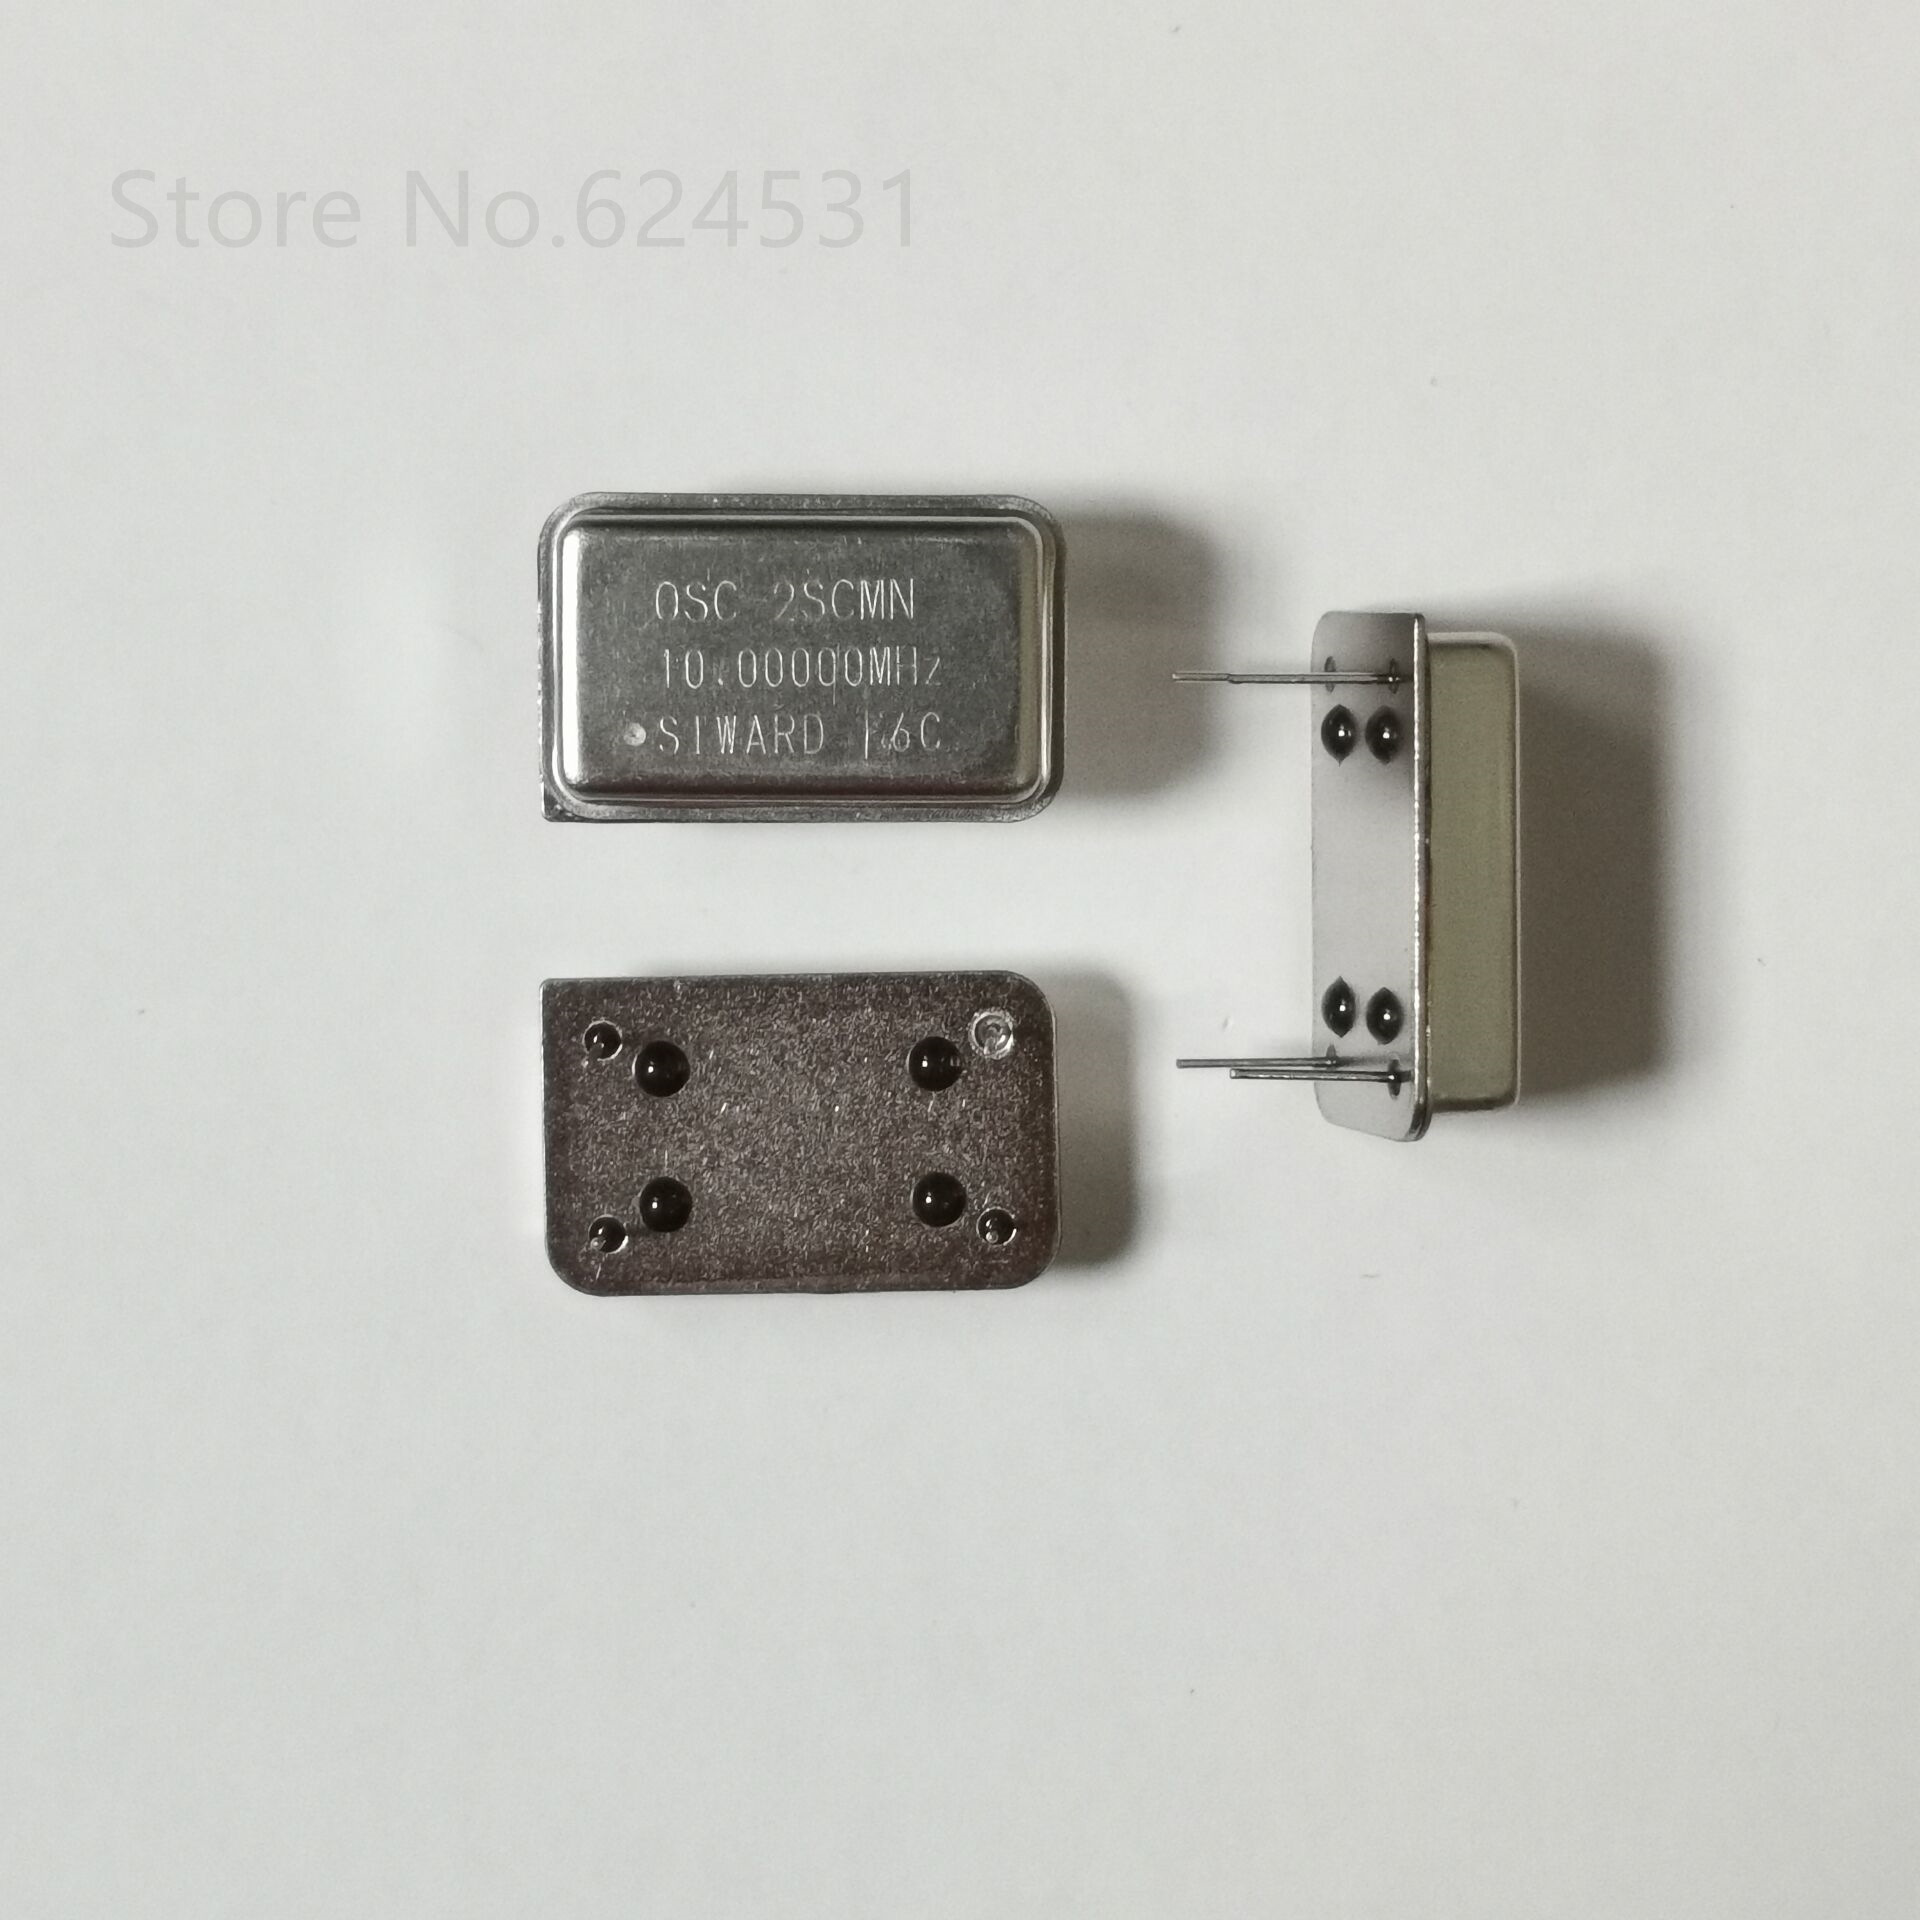 5pcs In-line Active Crystal OSC DIP-4 Rectangular Clock Vibration Full Size 10M 10MHZ 10.000MHZ